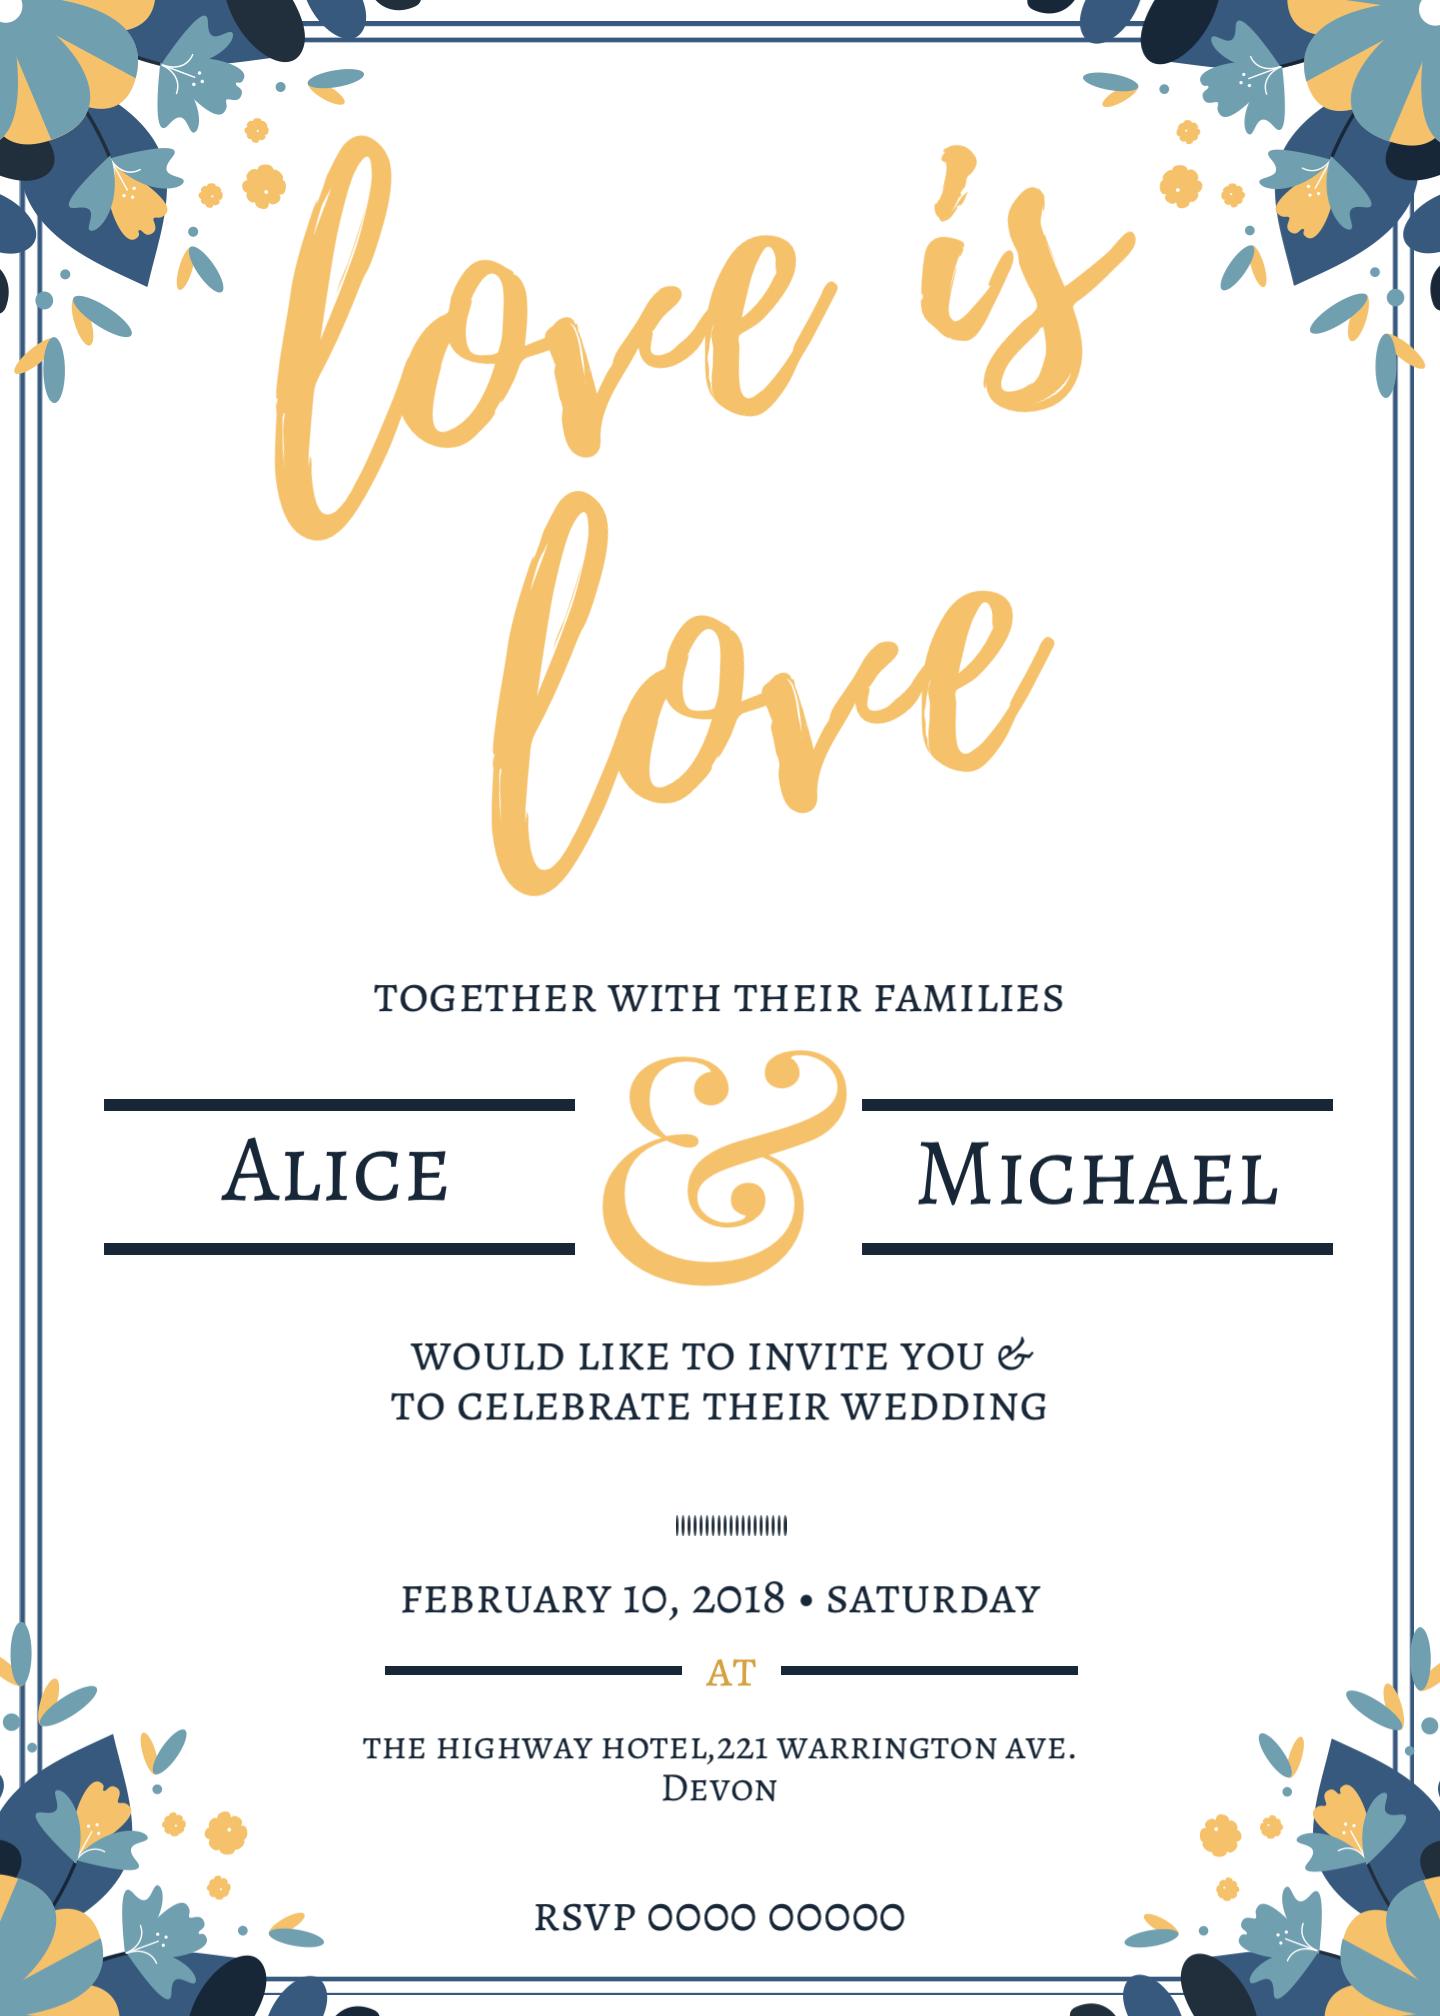 Wedding Invitation - Wedding Invitation Template -Trending Now ...